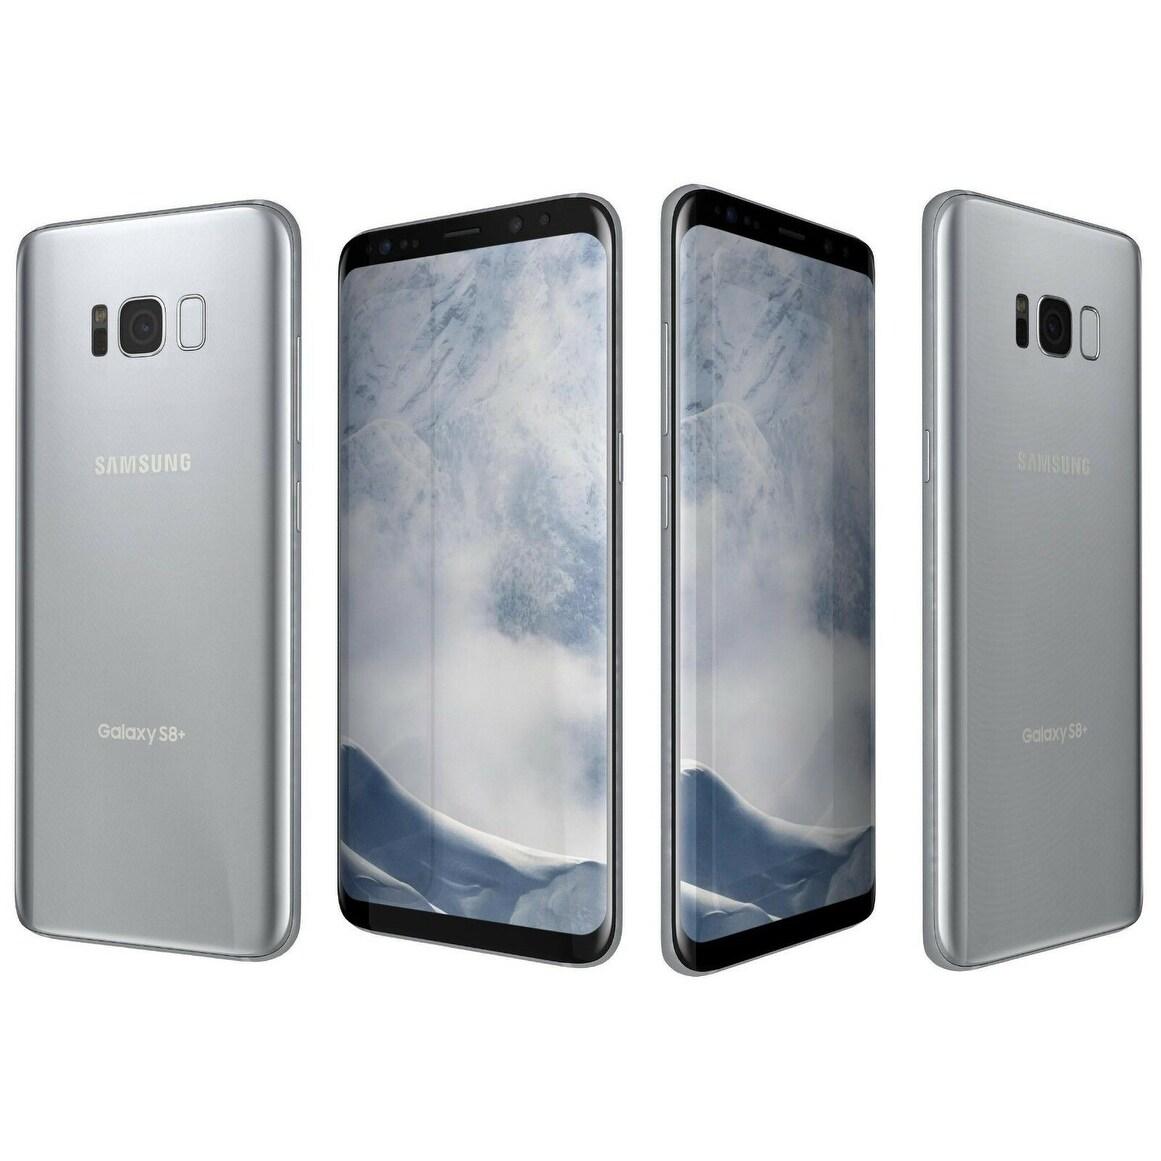 Samsung Galaxy S8 - 64GB - Verizon/T-Mobile/AT&T GSM Factory Unlocked 4G  LTE Smartphone